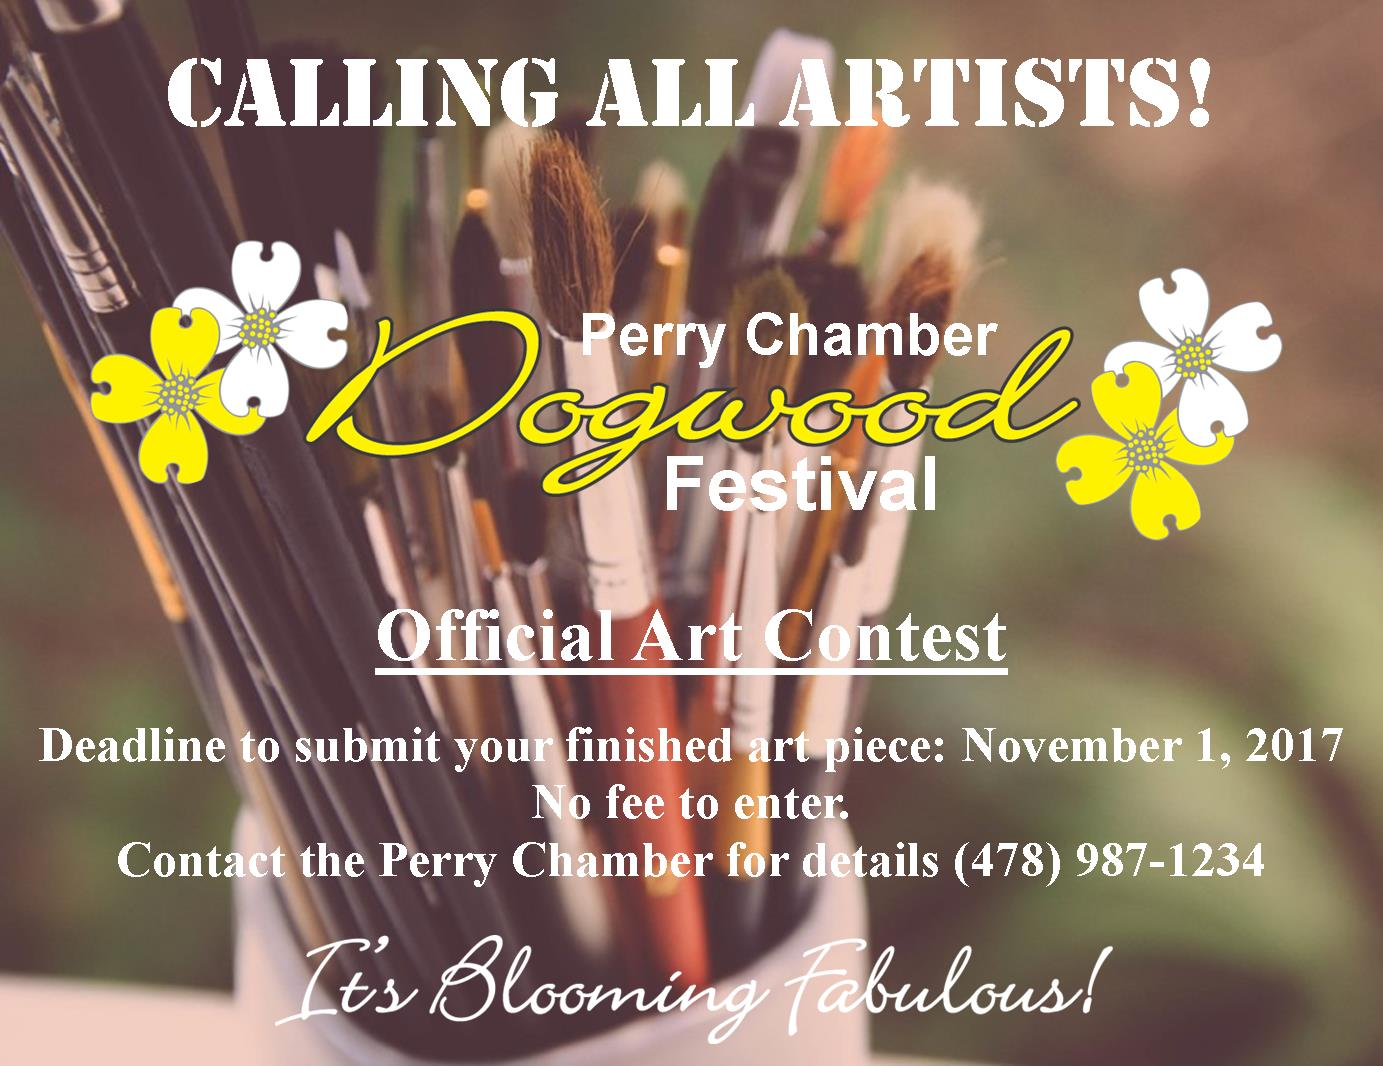 Calling-all-Artists-4.jpg